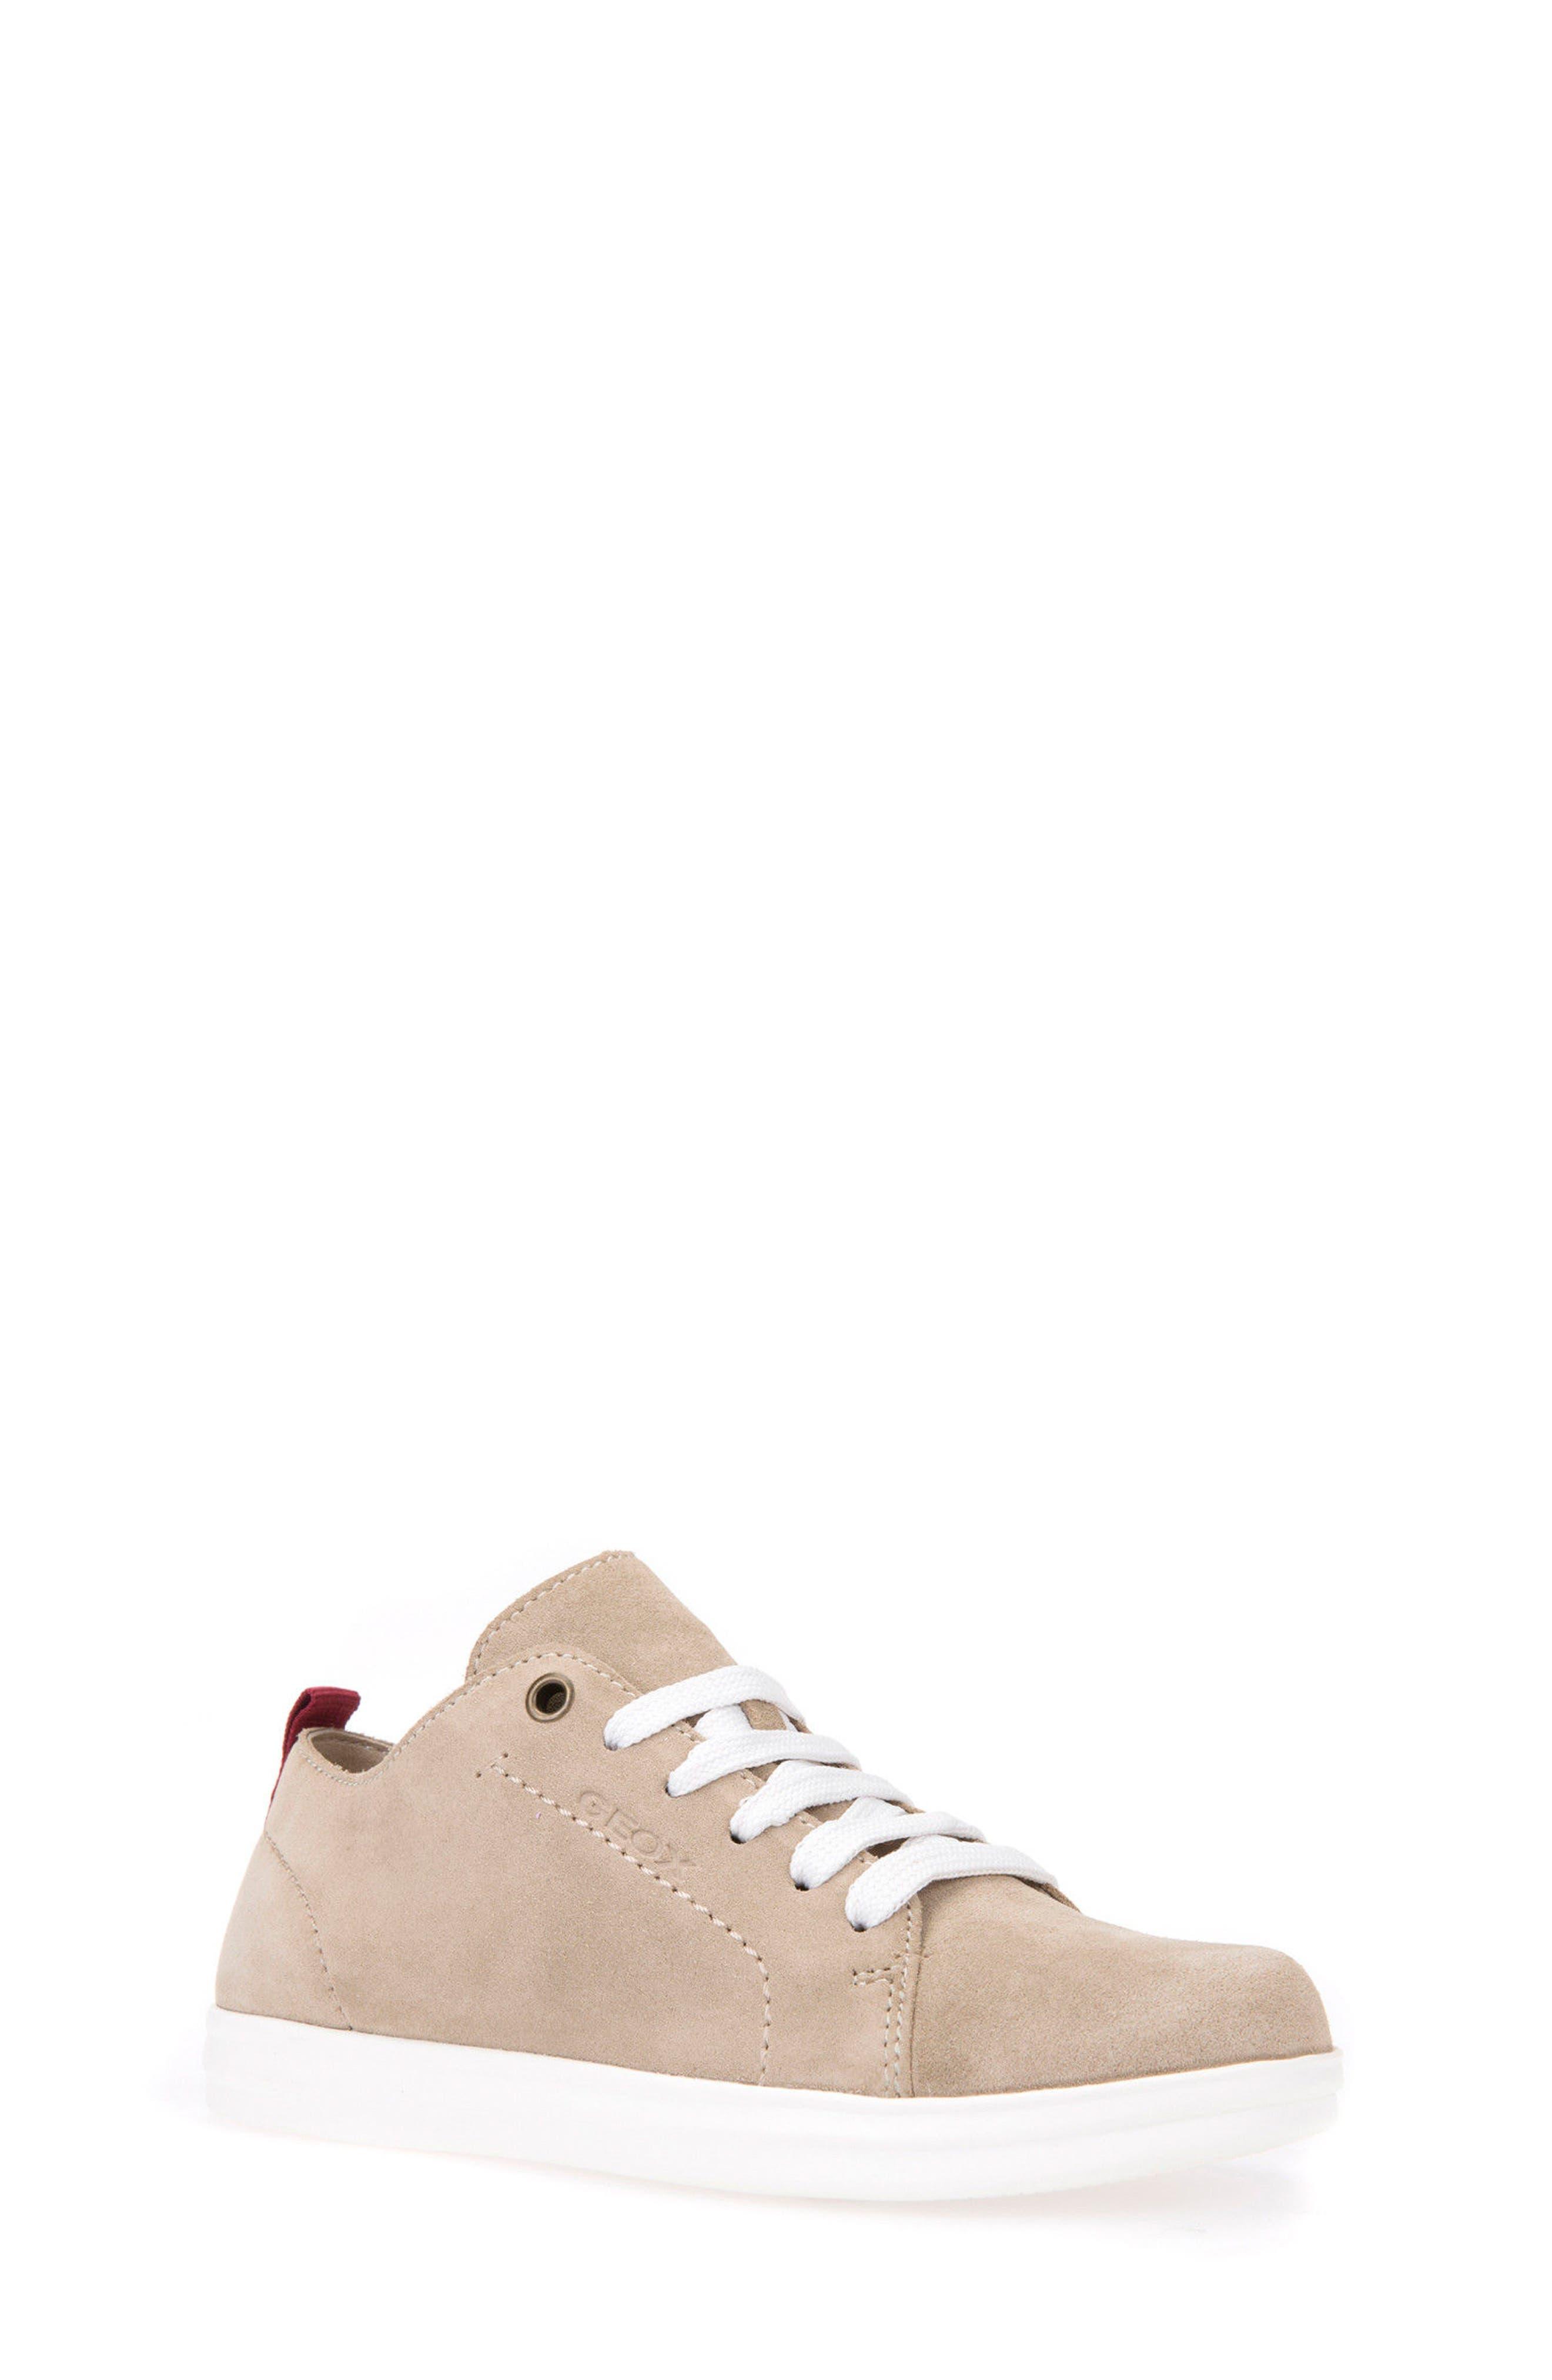 Anthor Low Top Sneaker,                         Main,                         color, BEIGE